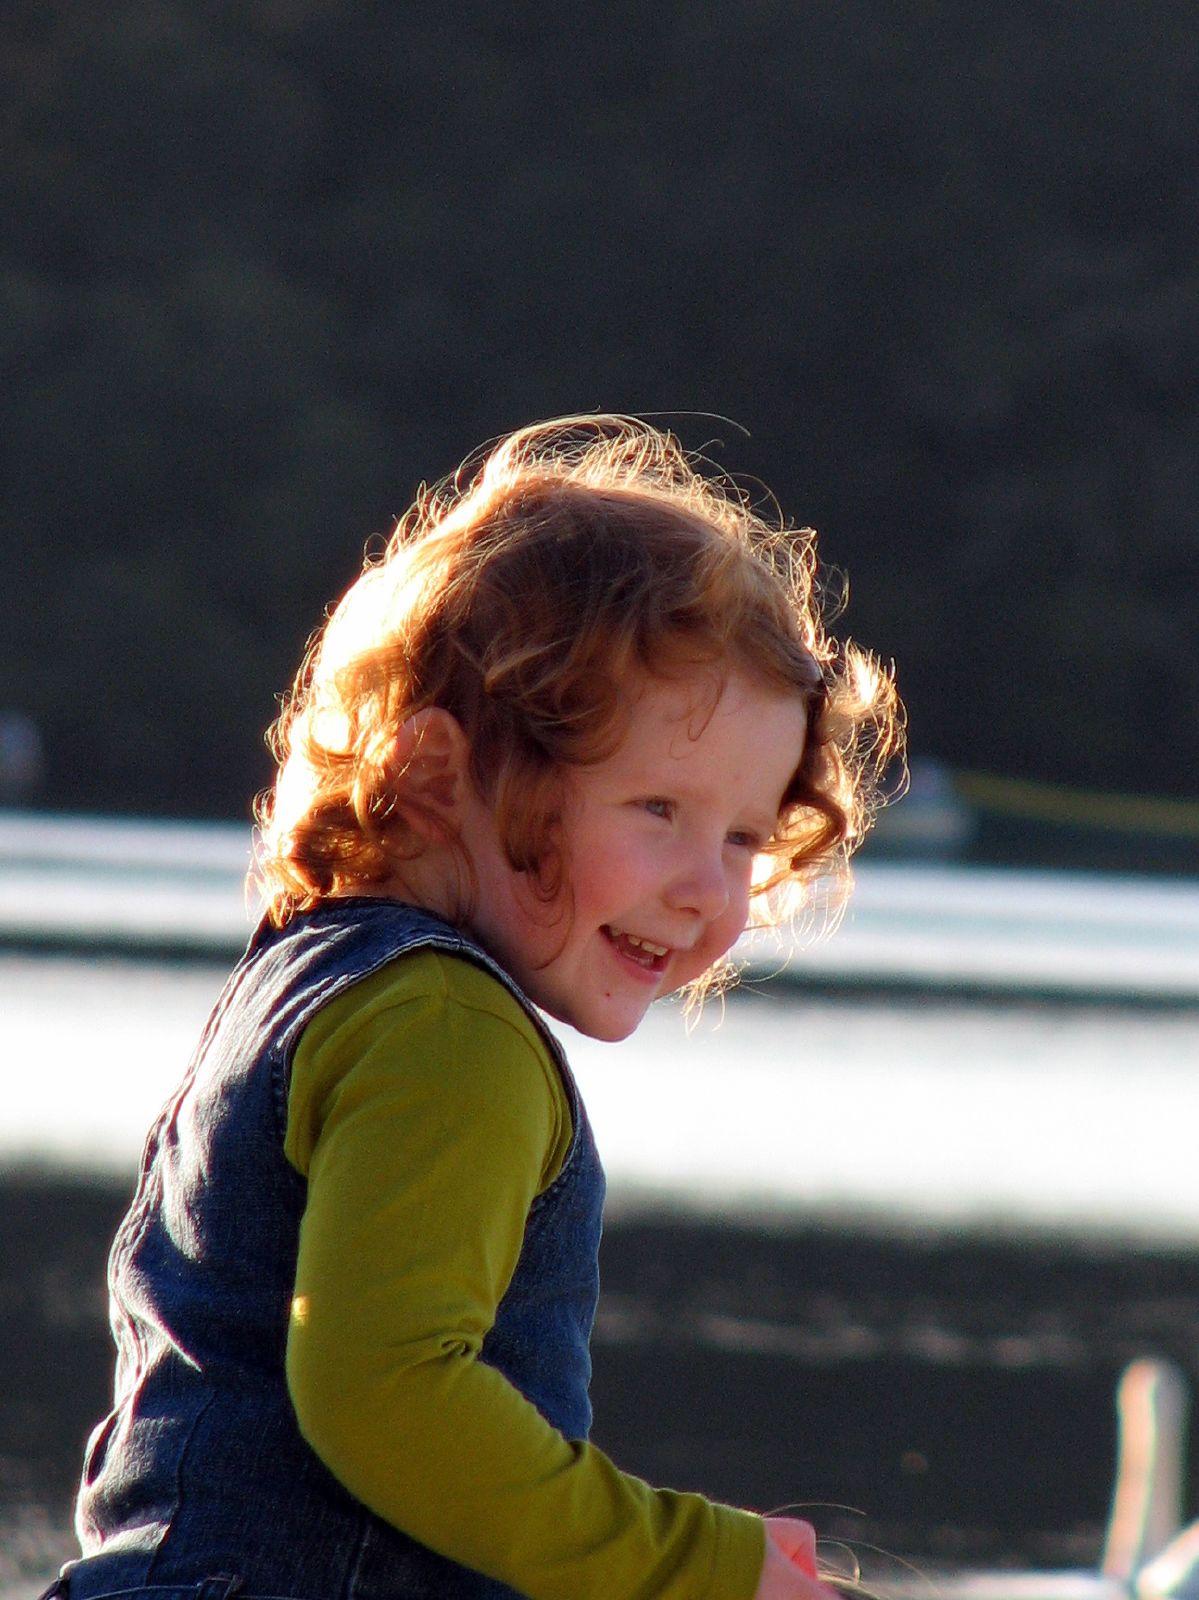 f9351adf39 Little Irish Girl by Dan Noon on Flickr